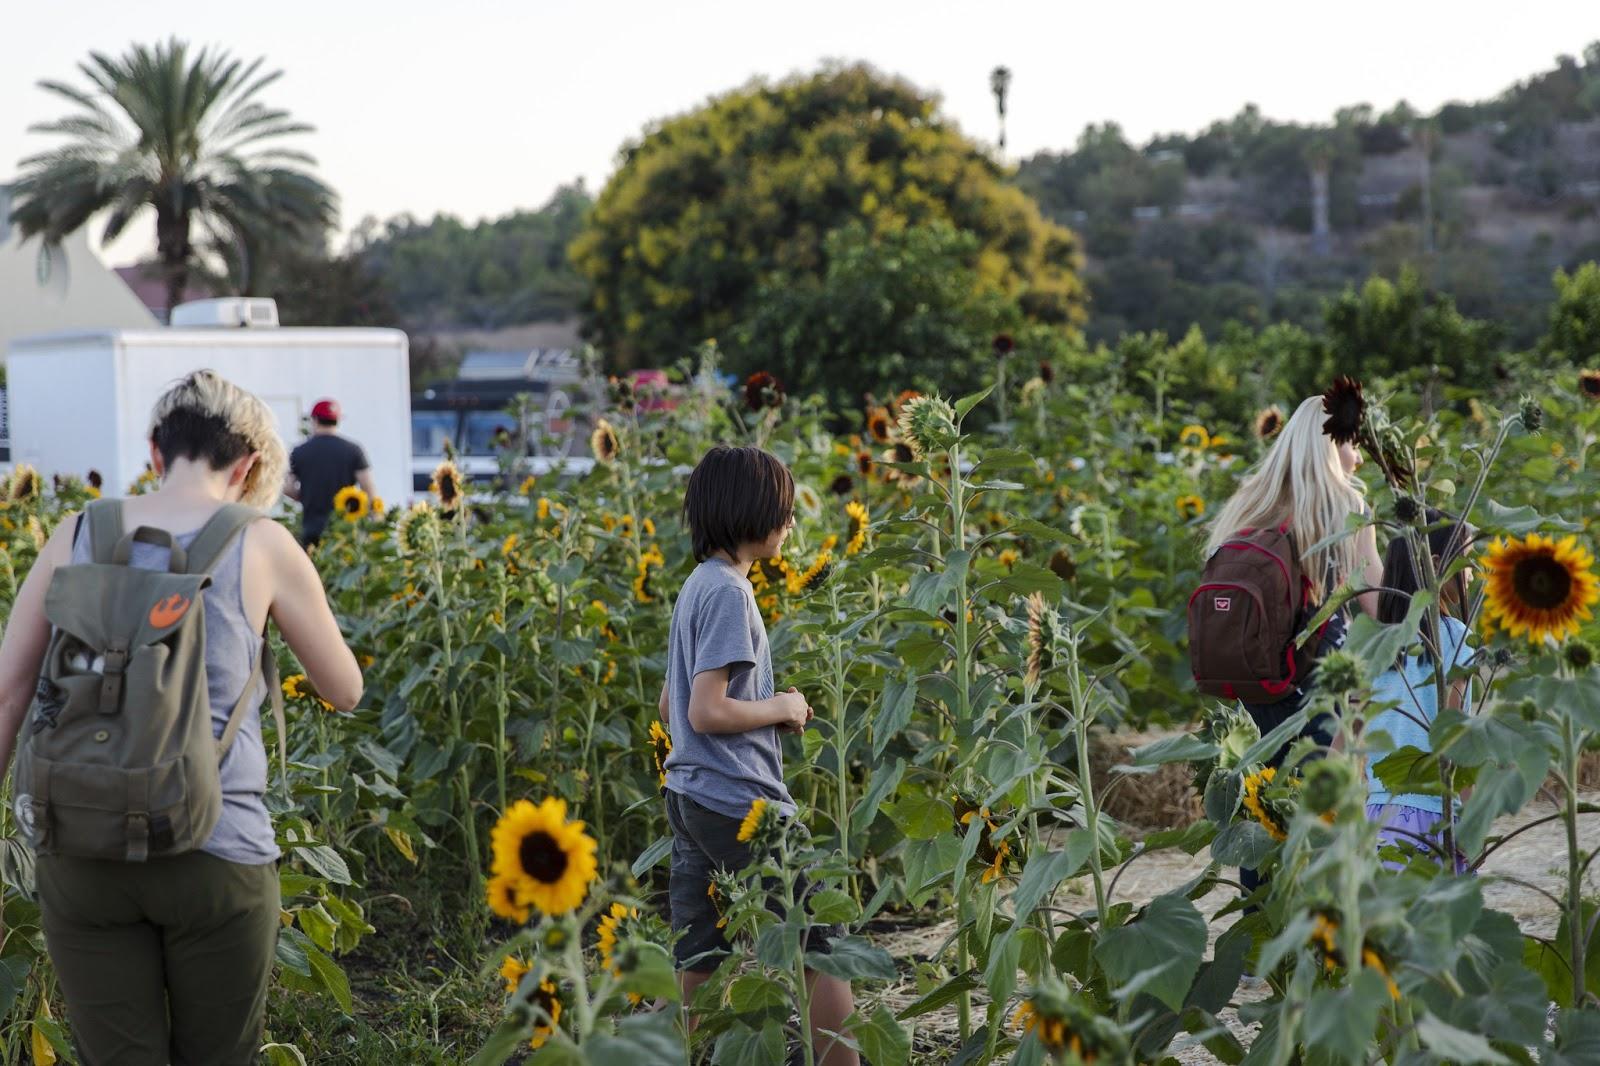 People walking through sunflower field